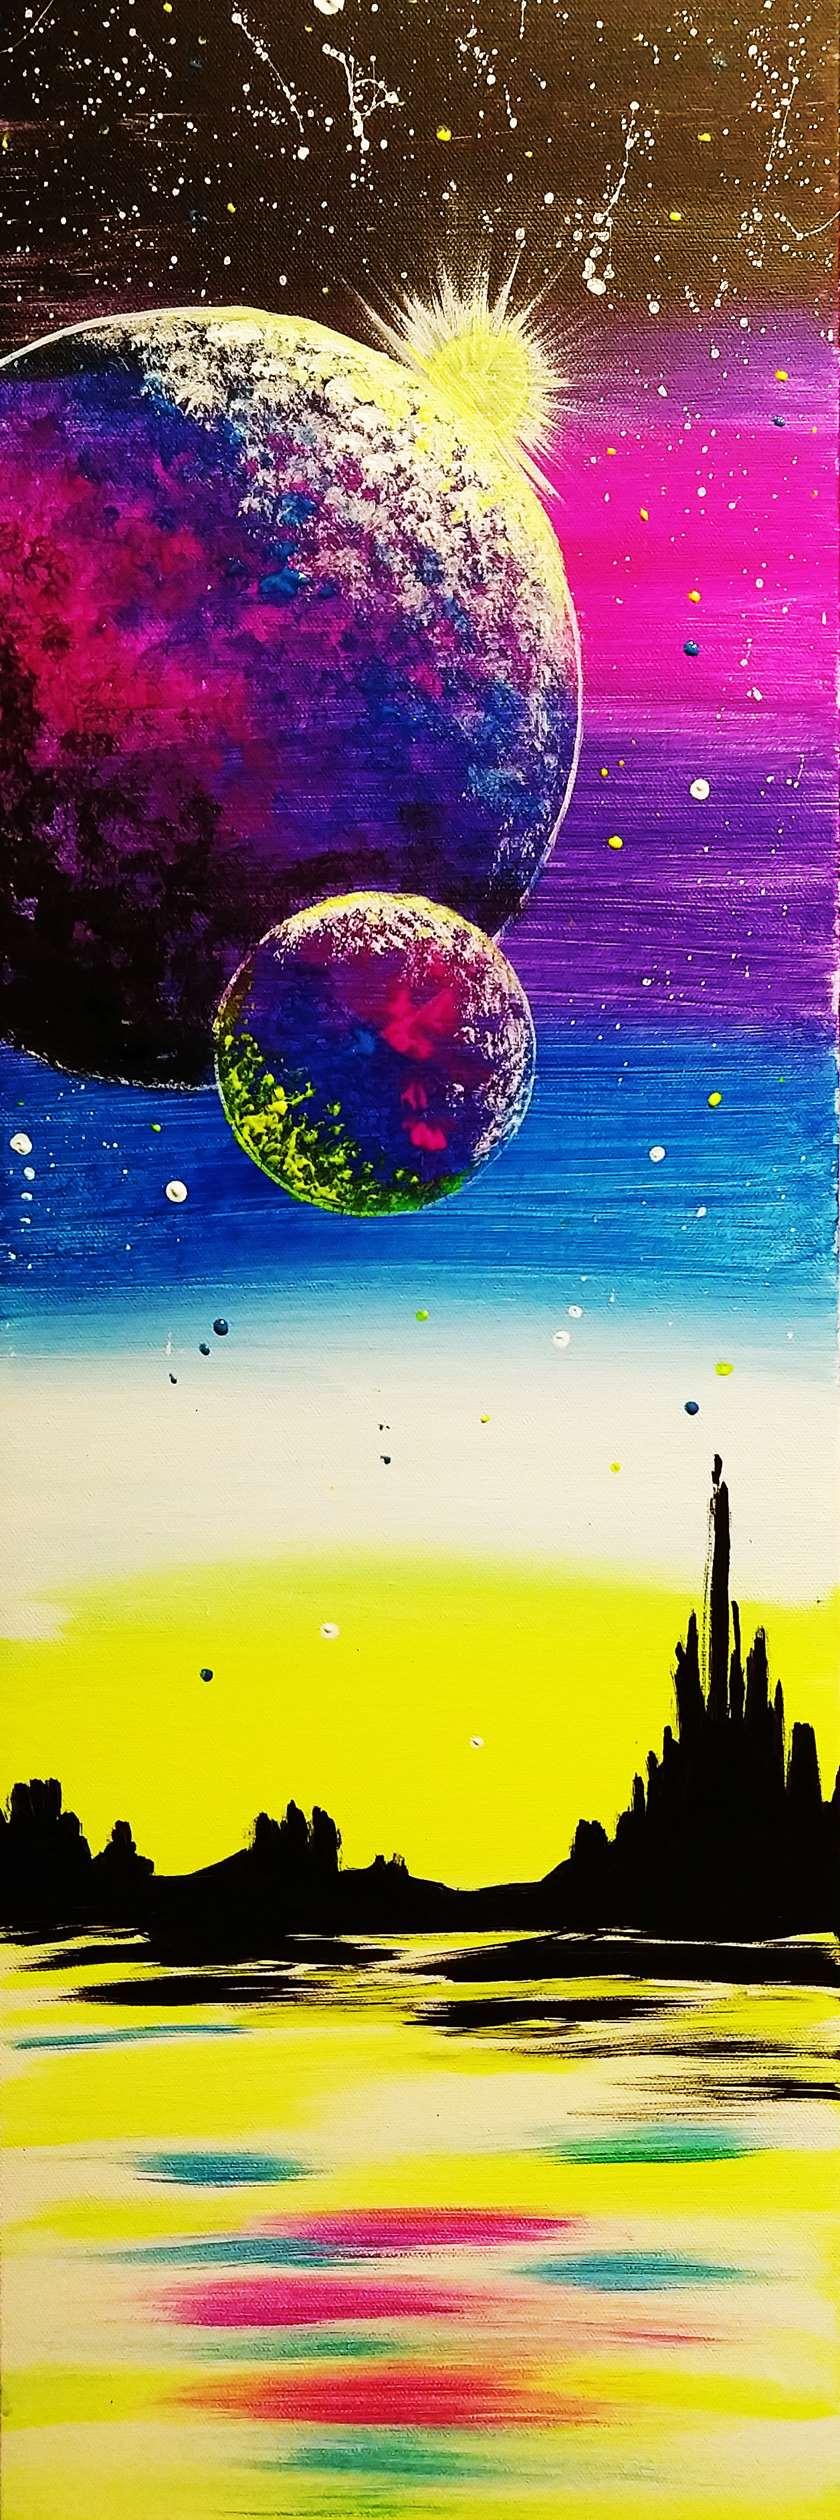 IN-STUDIO EVENT- EDGE OF SPACE